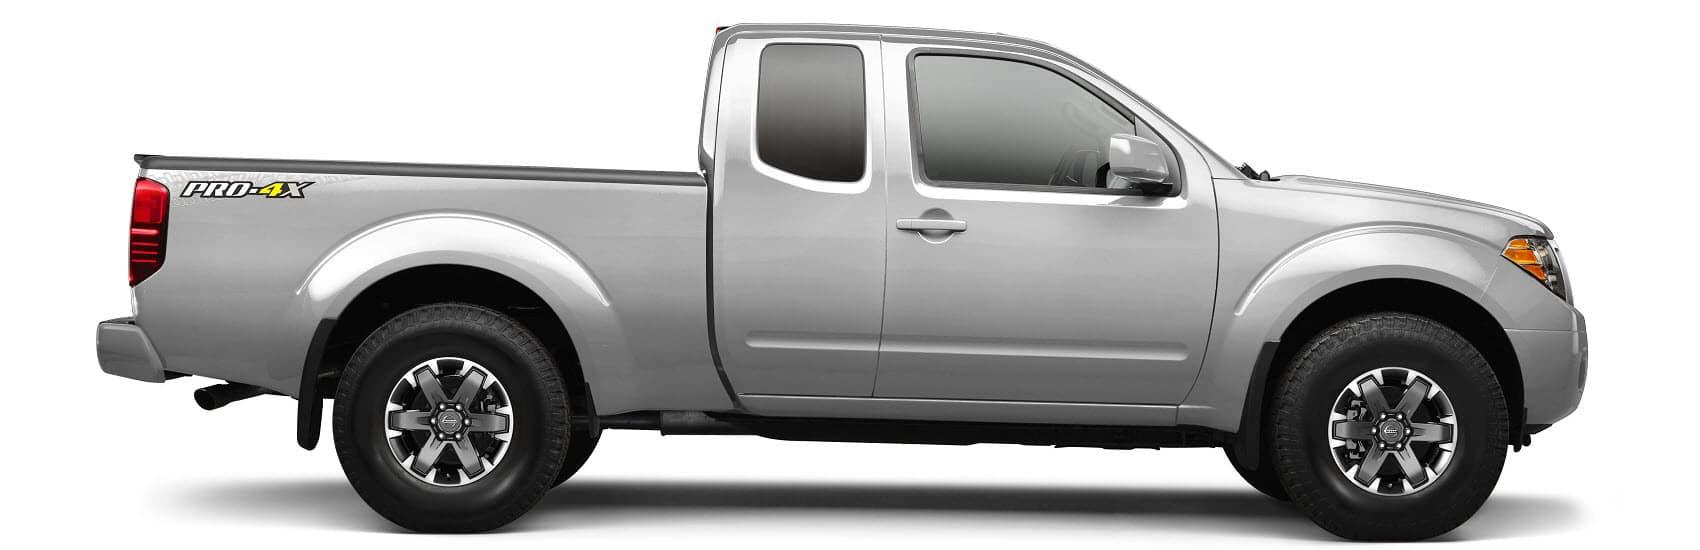 Silber 2015 Nissan Titan Pro